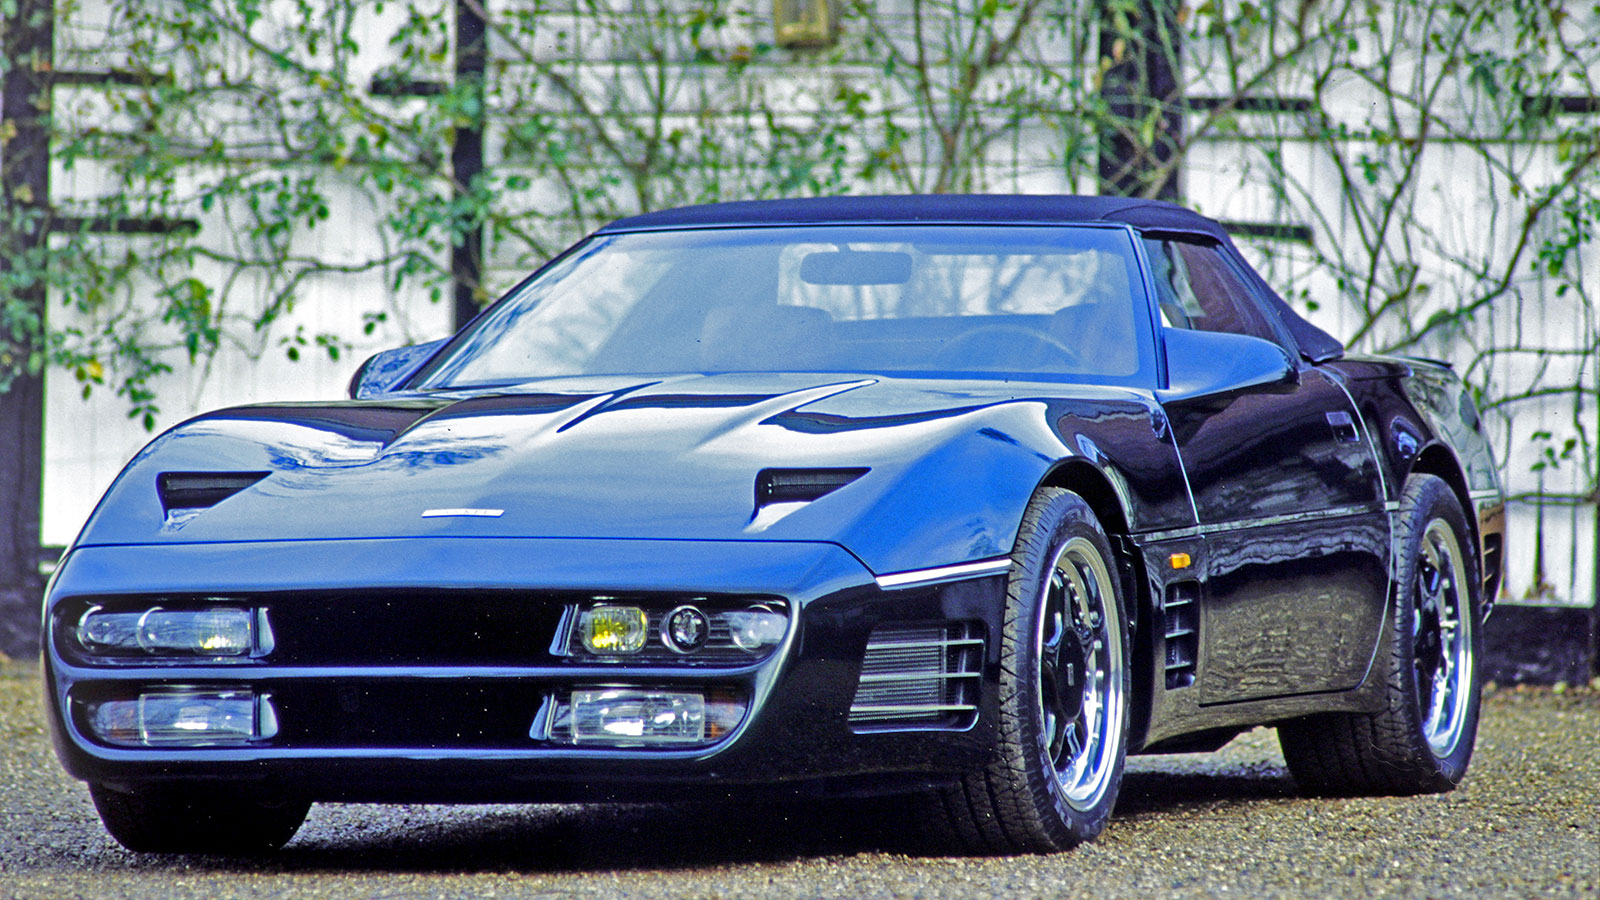 Cars That Time Forgot: Jankel Tempest